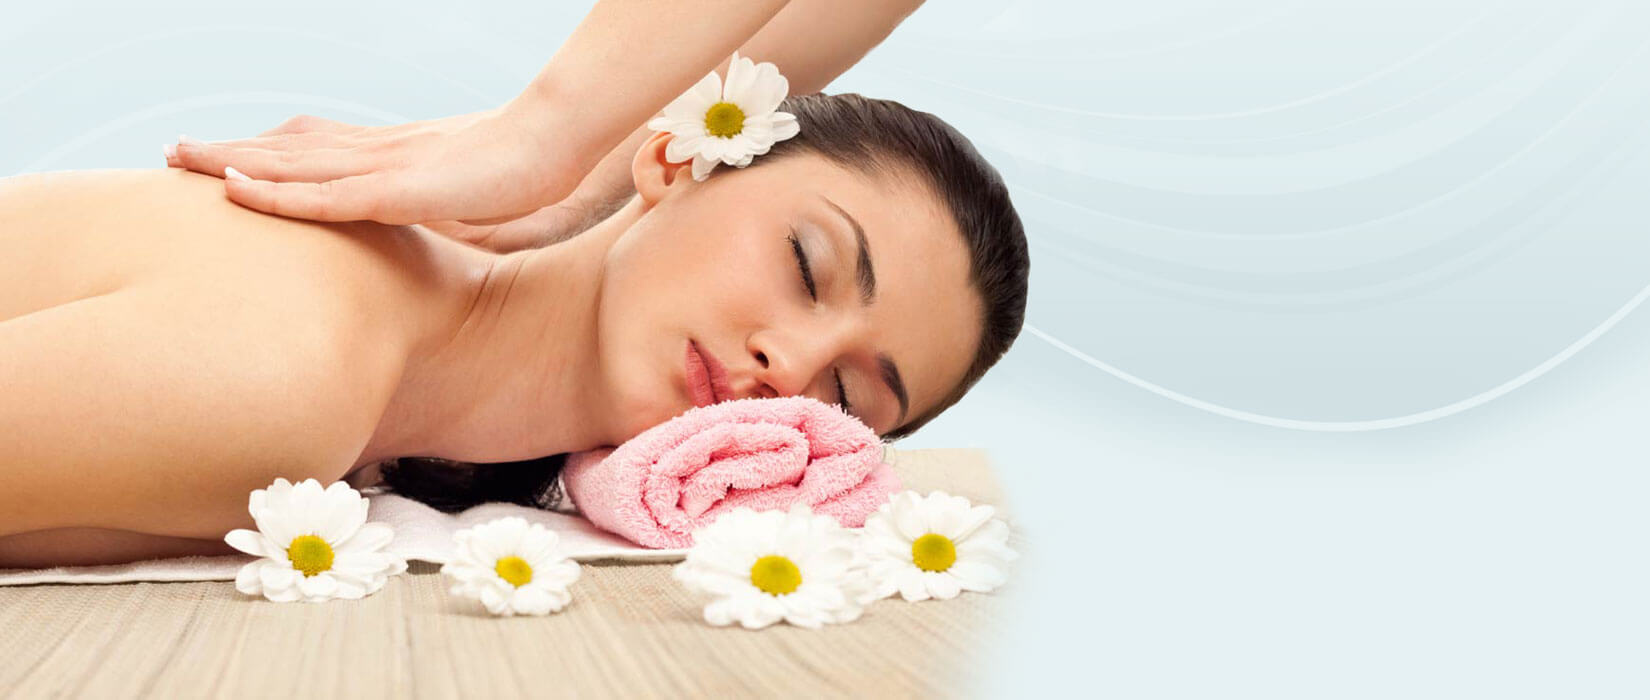 Thai Massage in Abu Dhabi